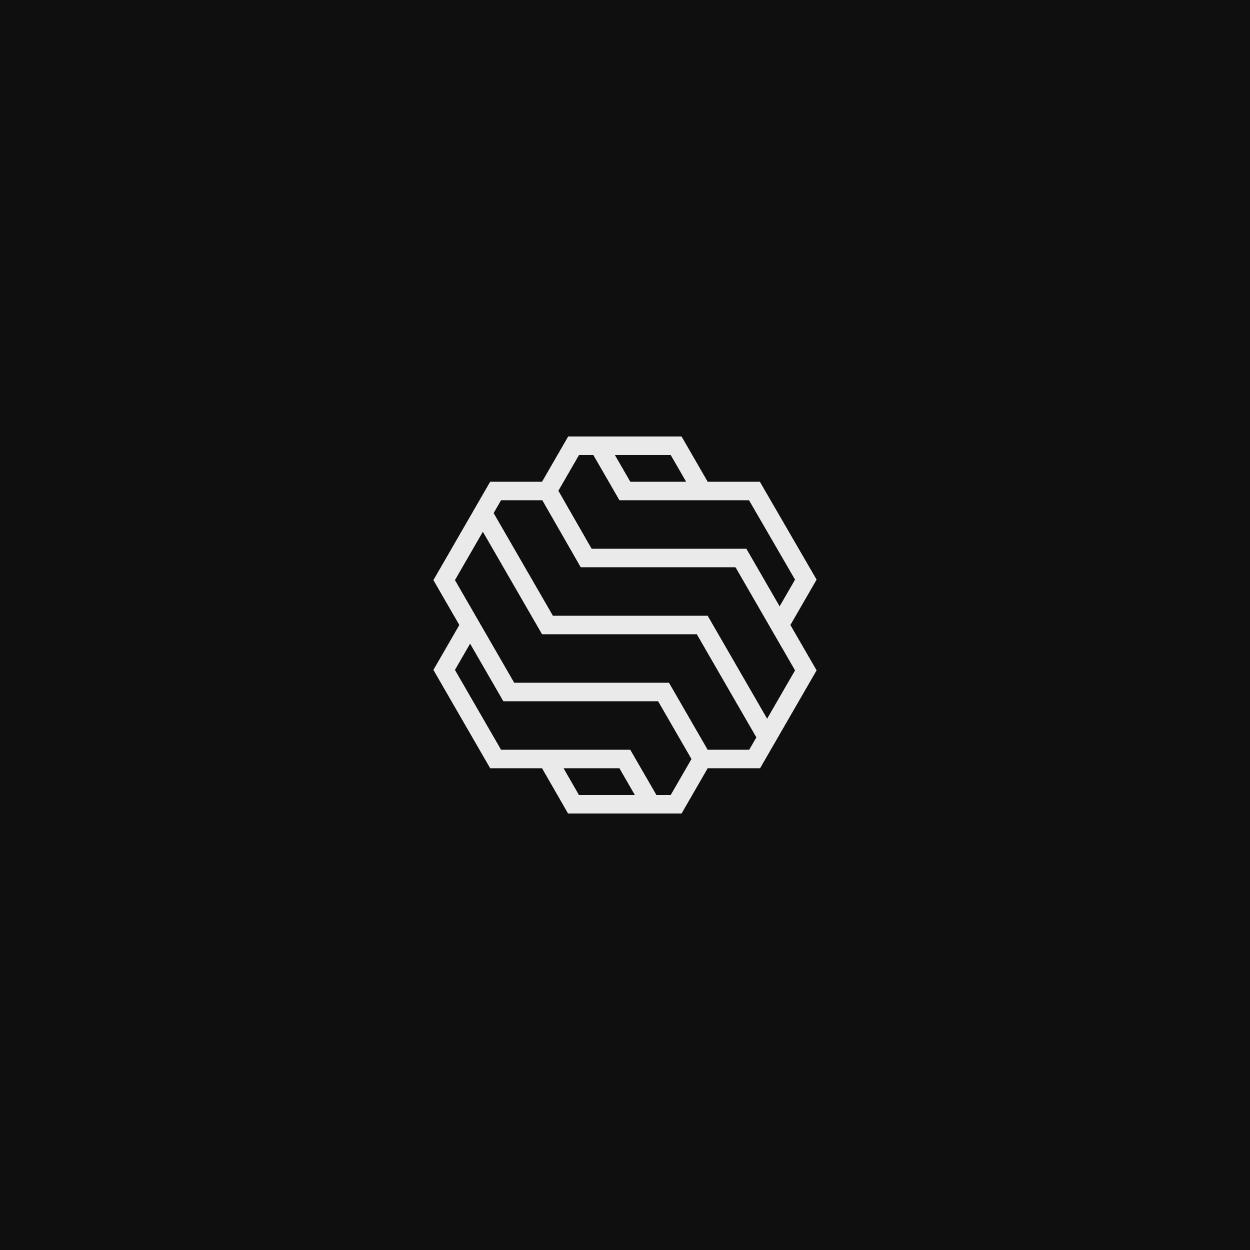 Sylvan_Logofolio2019_Artboard 119 copy1250.jpg